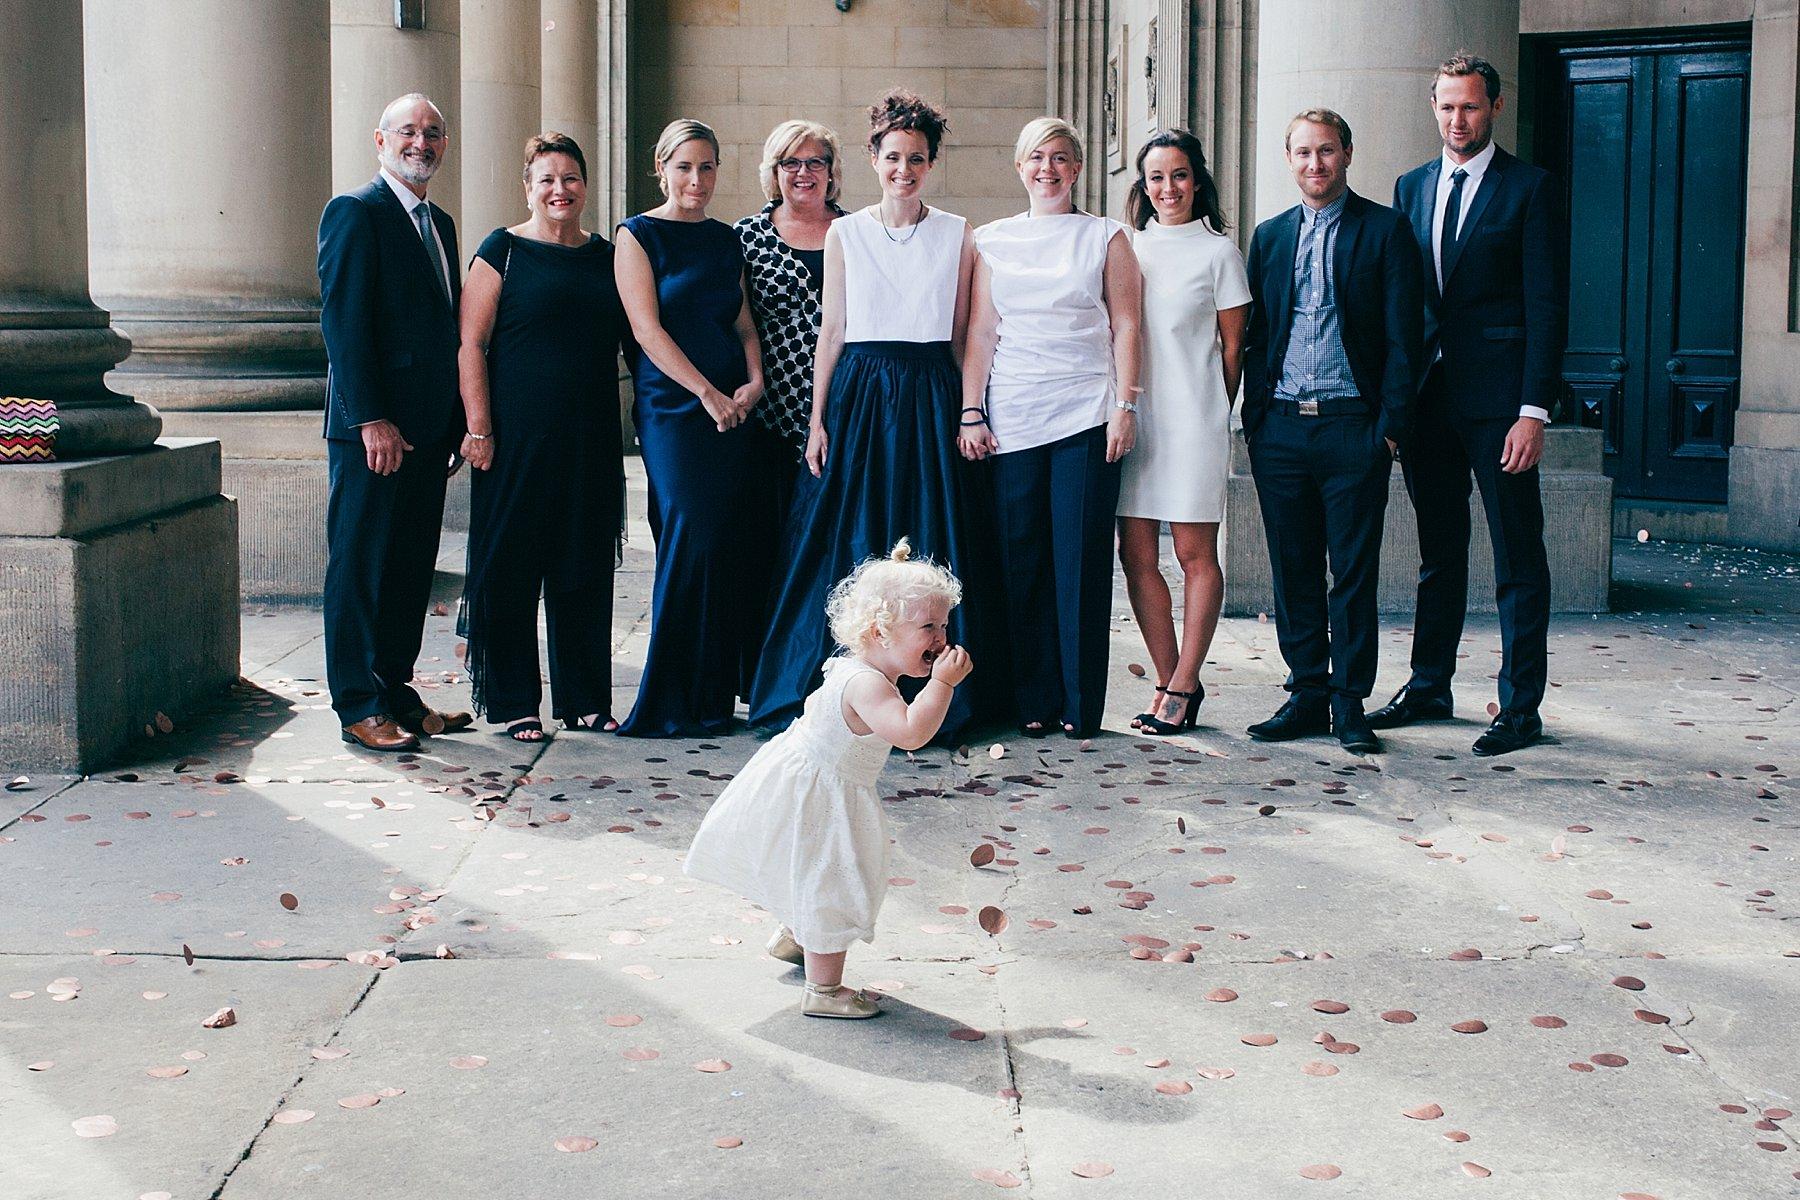 CV-292 Leeds baby photobombing wedding formal photos.jpg